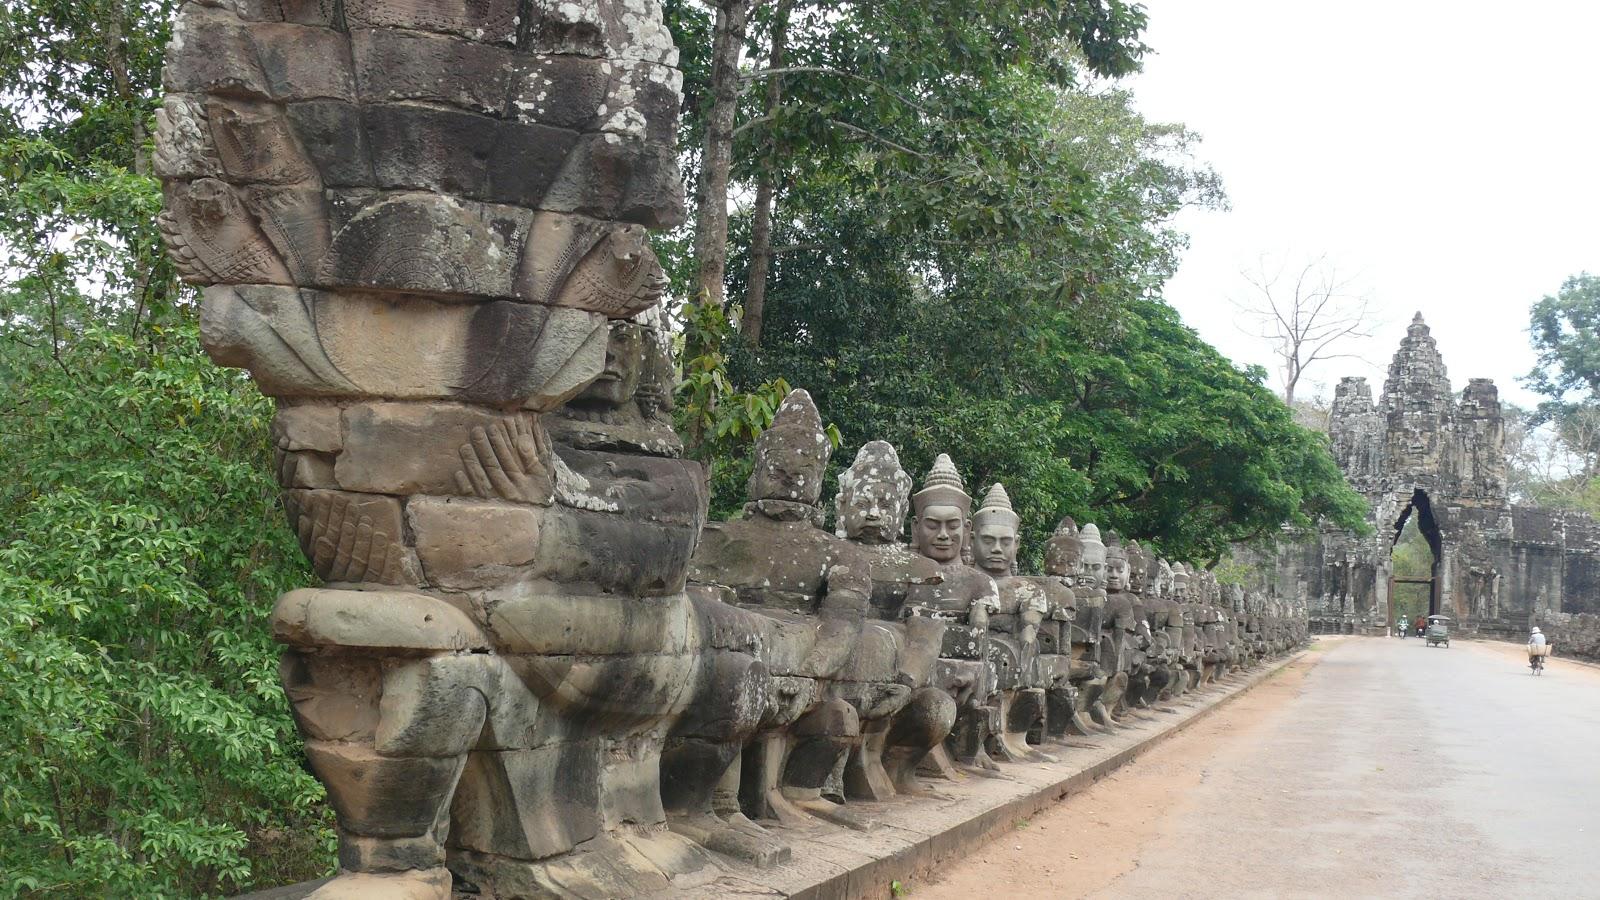 pimlico4: Angkor Wat